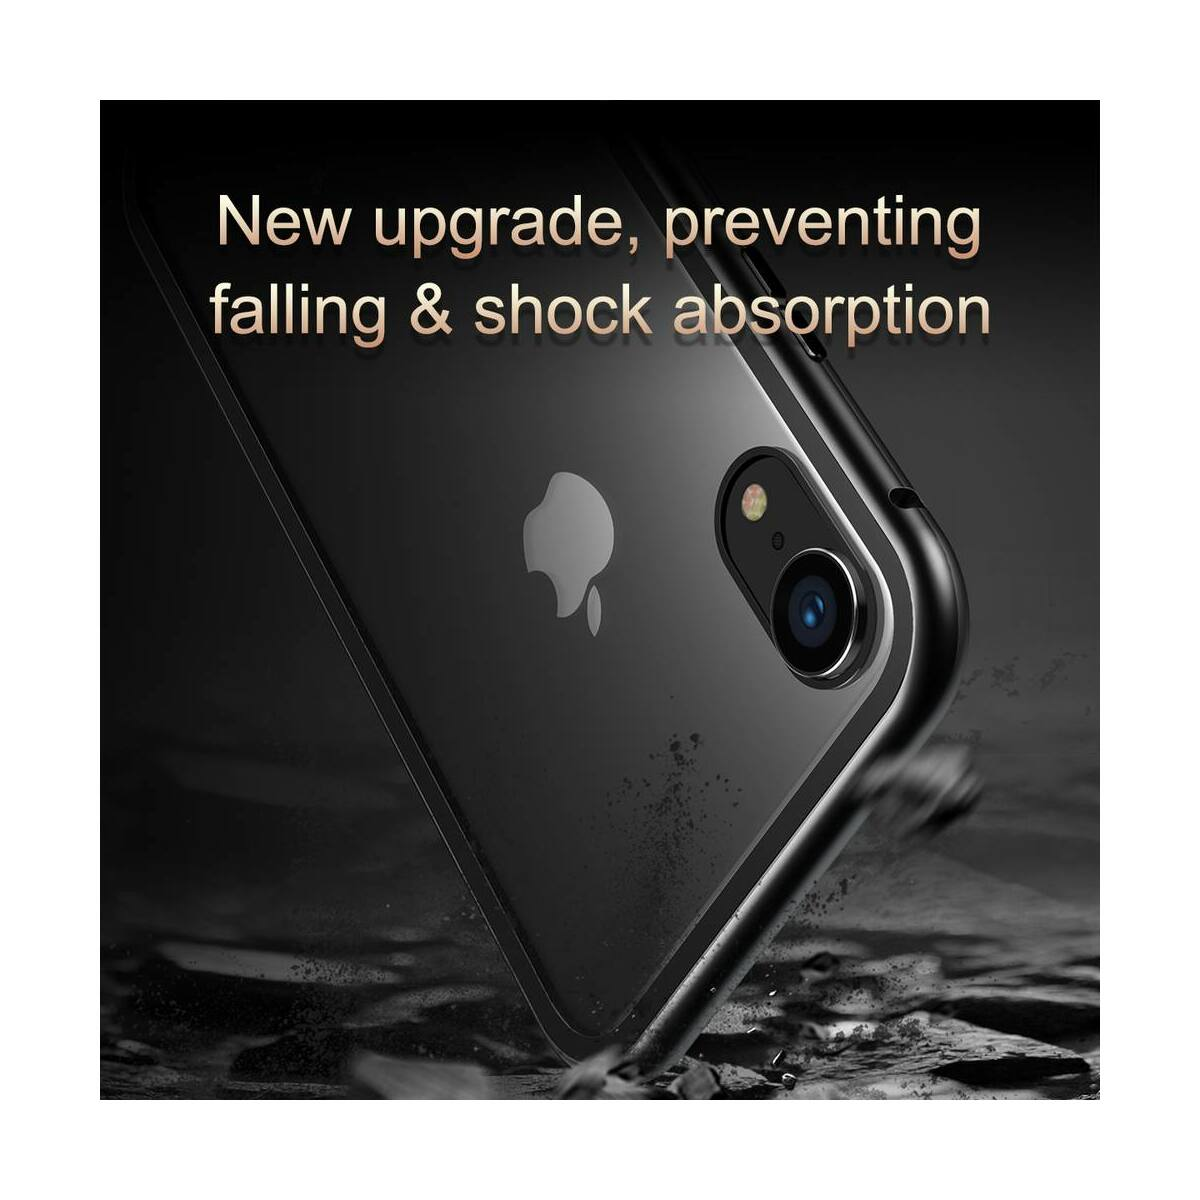 Baseus iPhone XR tok, Magnetite hardware, mágneses, arany (WIAPIPH61-CS0V)